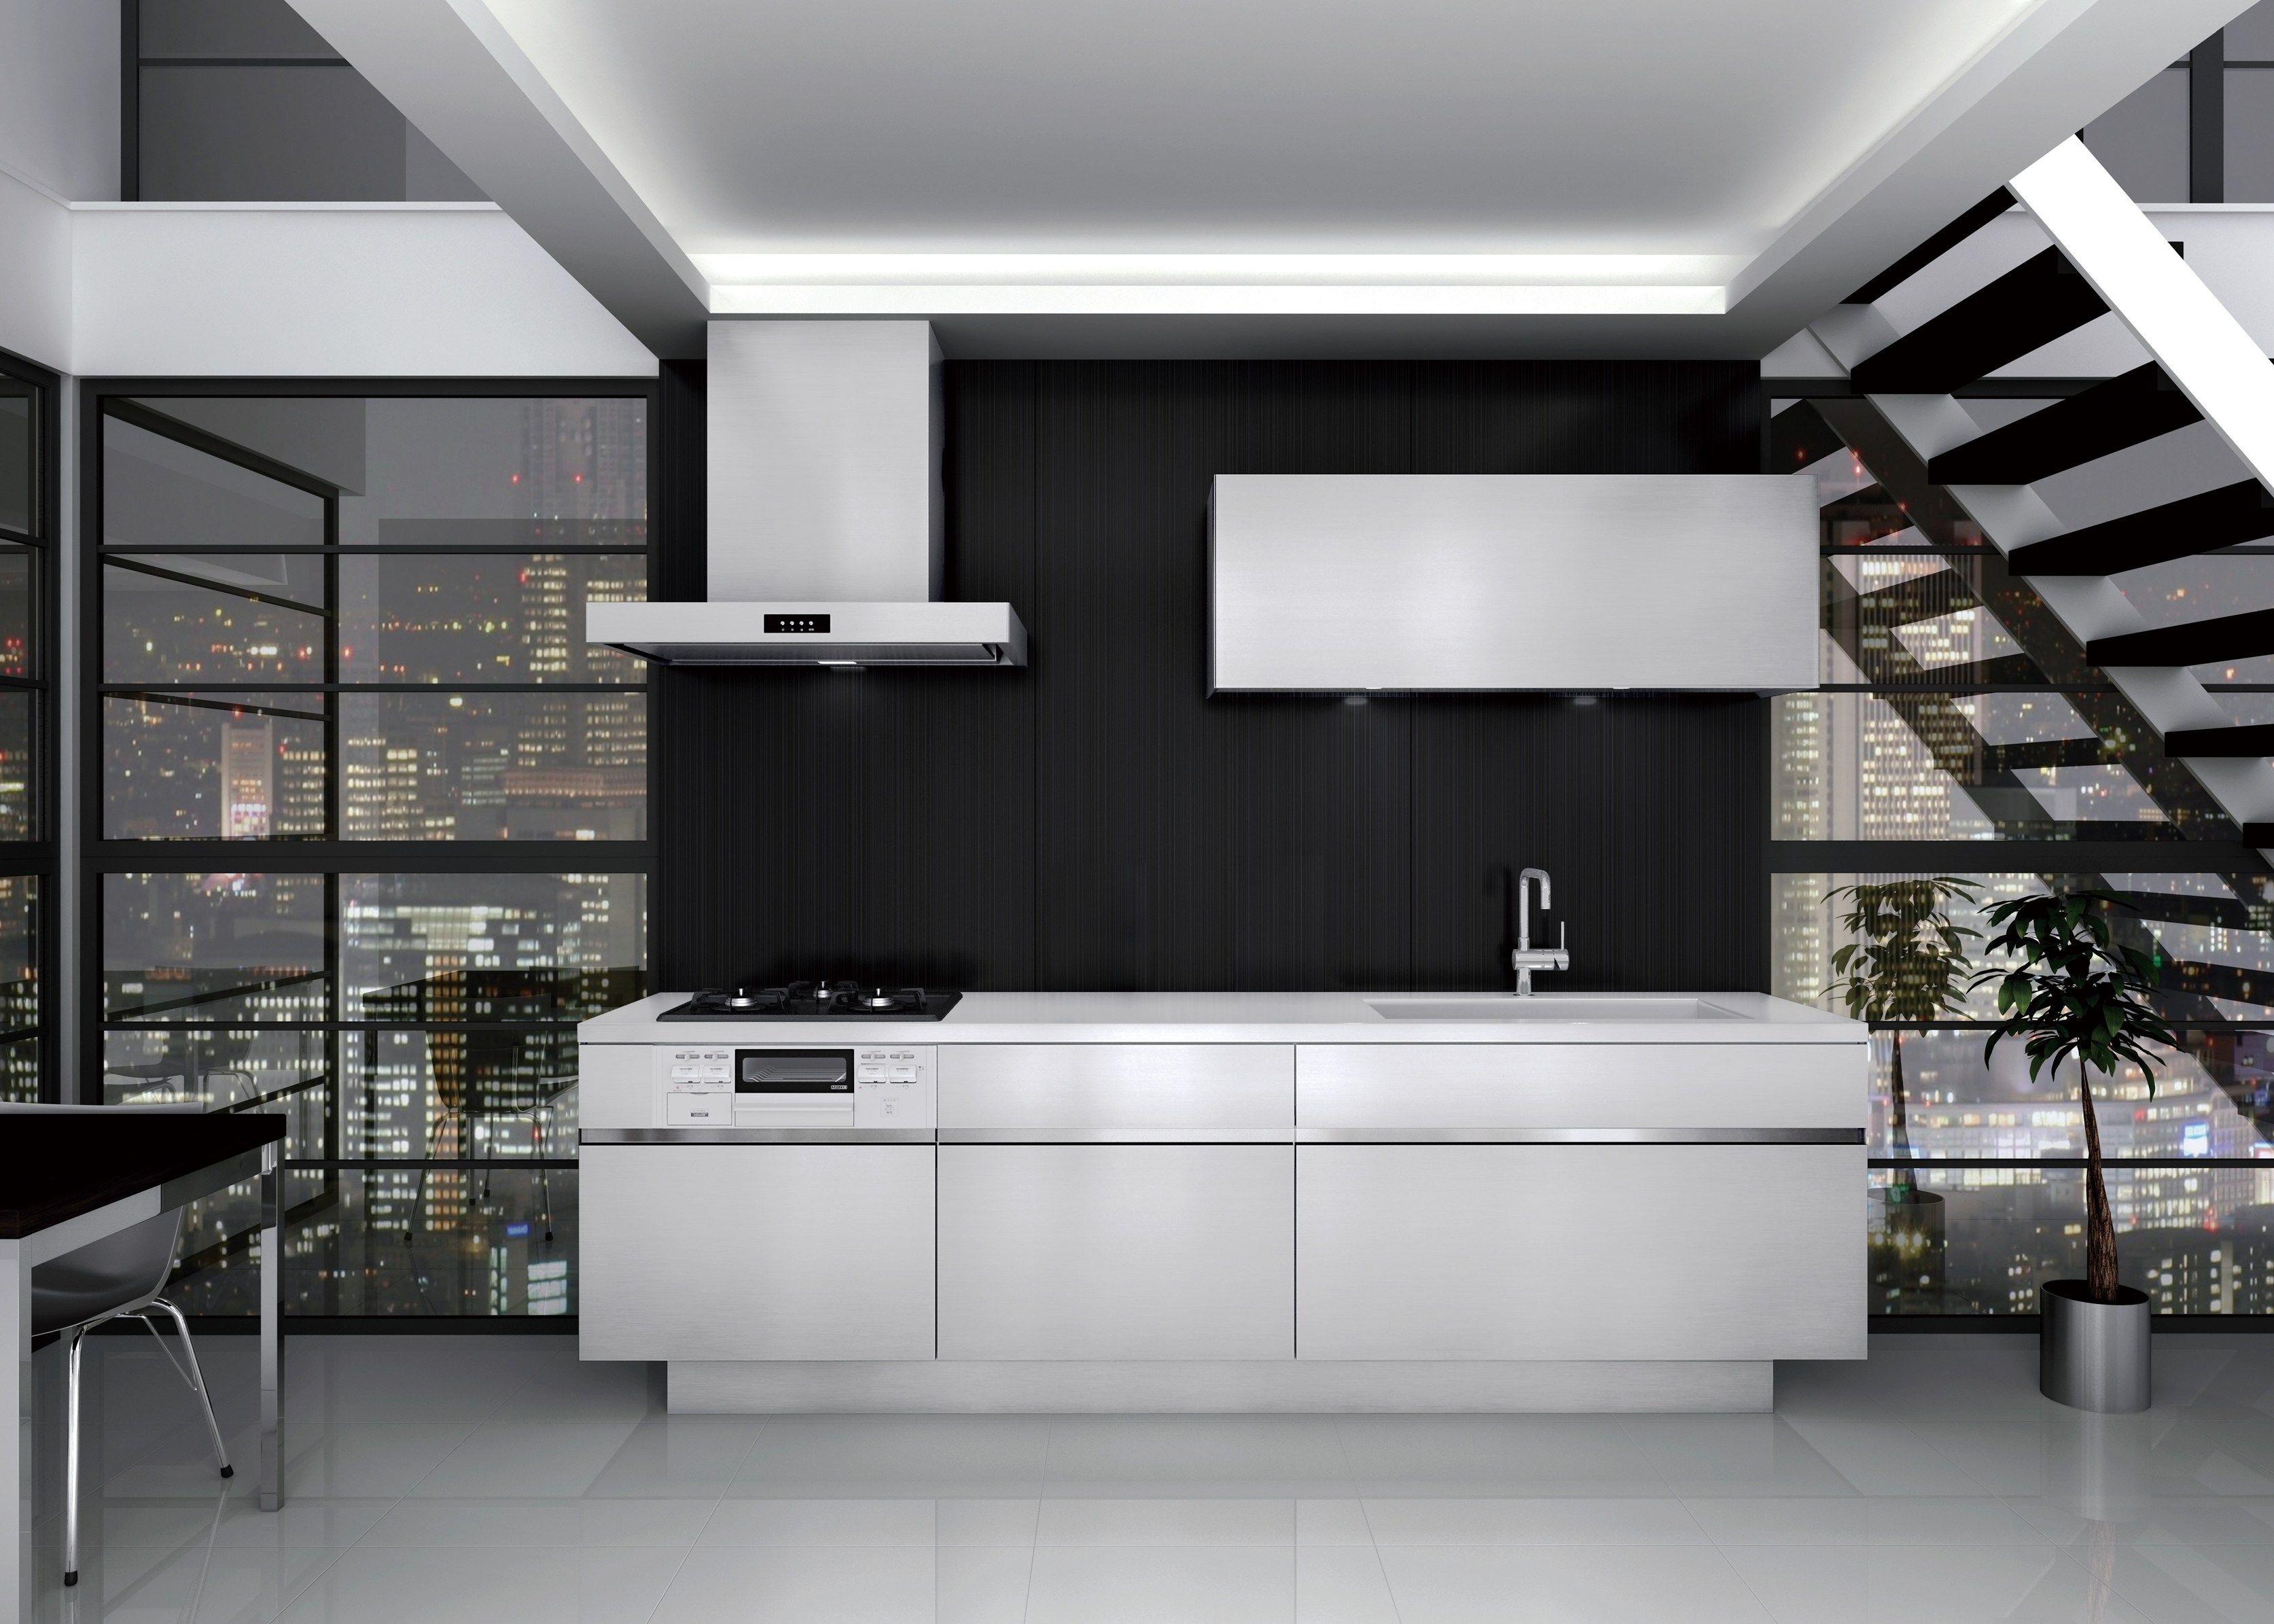 Cucina in acciaio inox senza maniglie grad45 by sanwa company - Maniglie cucina ...